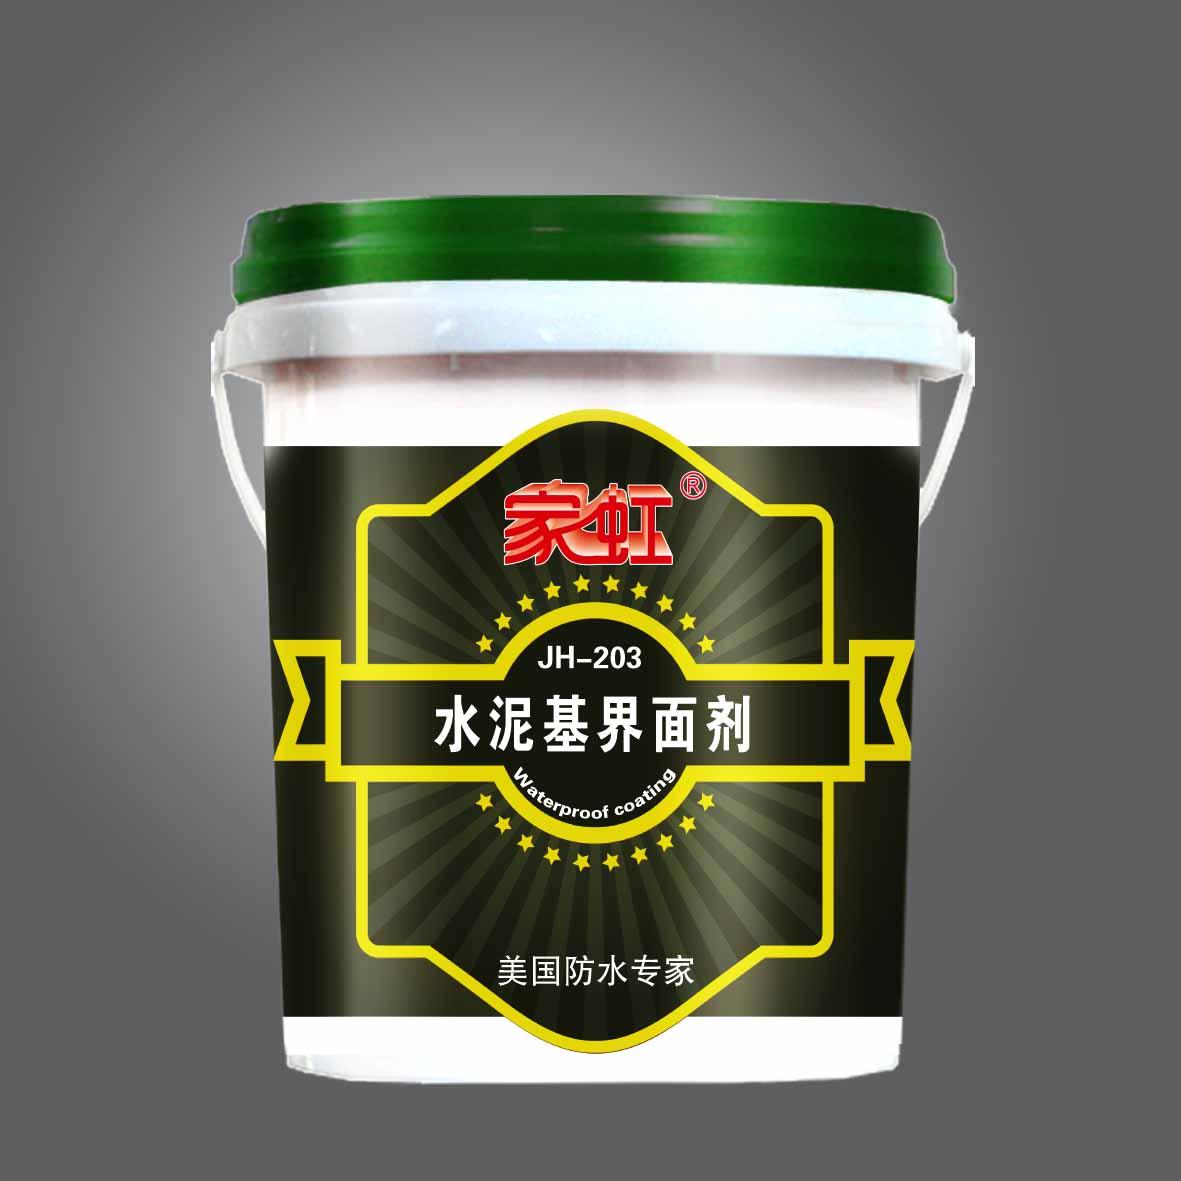 JH-203 家虹聚合物水泥基界面剂